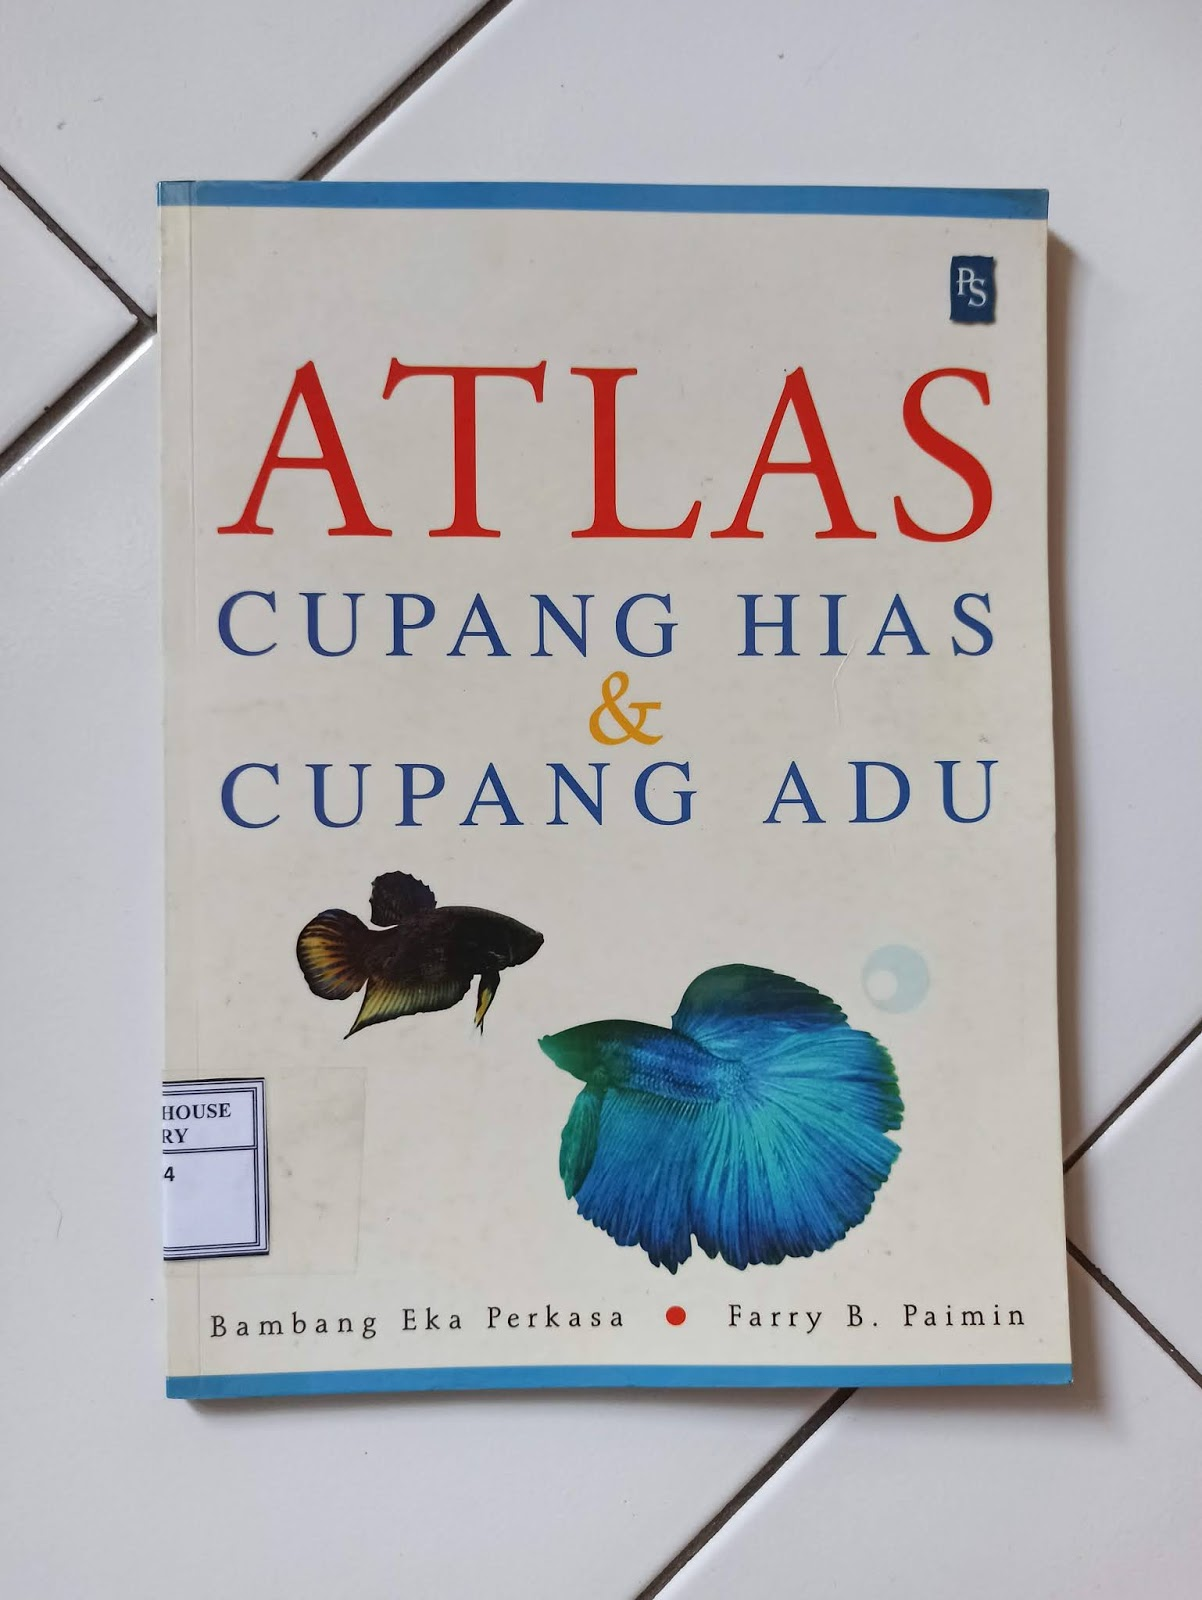 Buku Cupang Karya Bambang Eka Perkasa